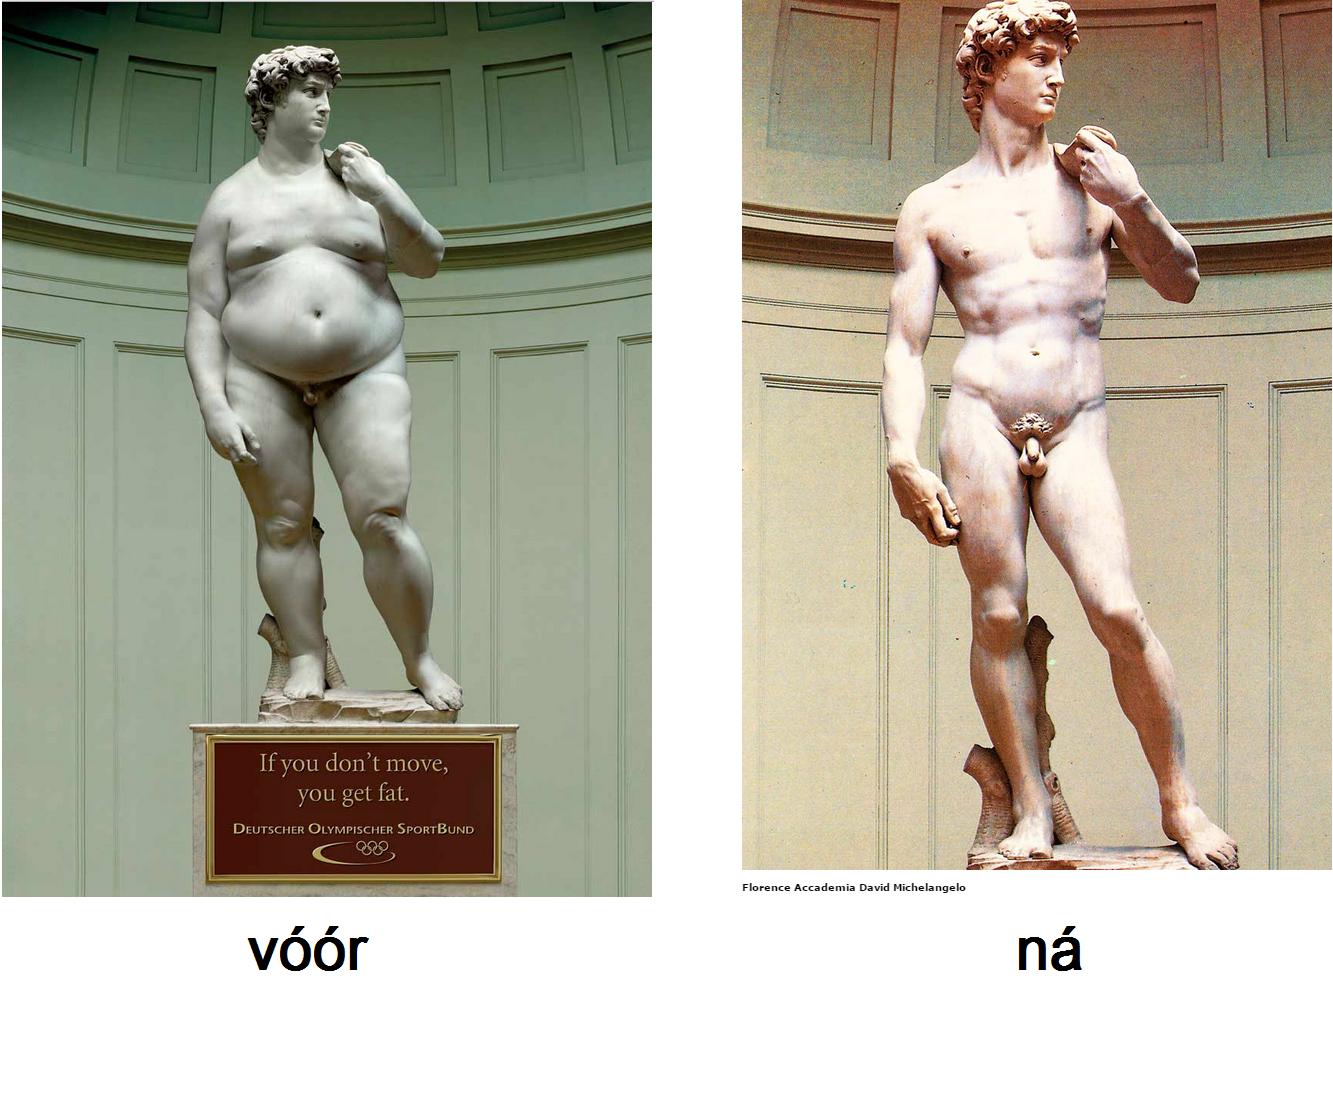 David fat - thin